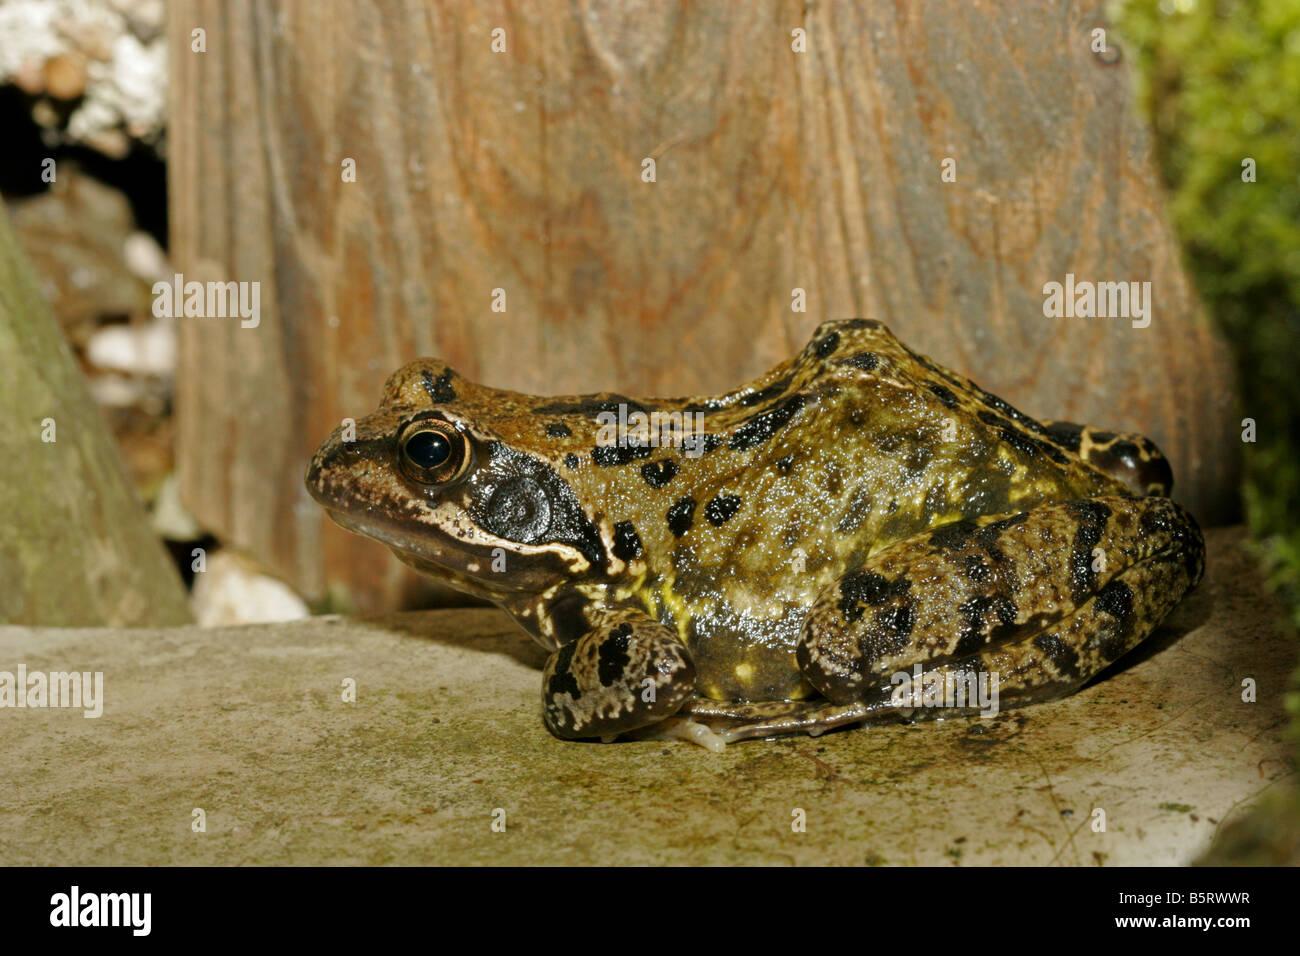 Common Frog Rana temporaria single adult resting on ledge of garden pond Taken June London UK - Stock Image